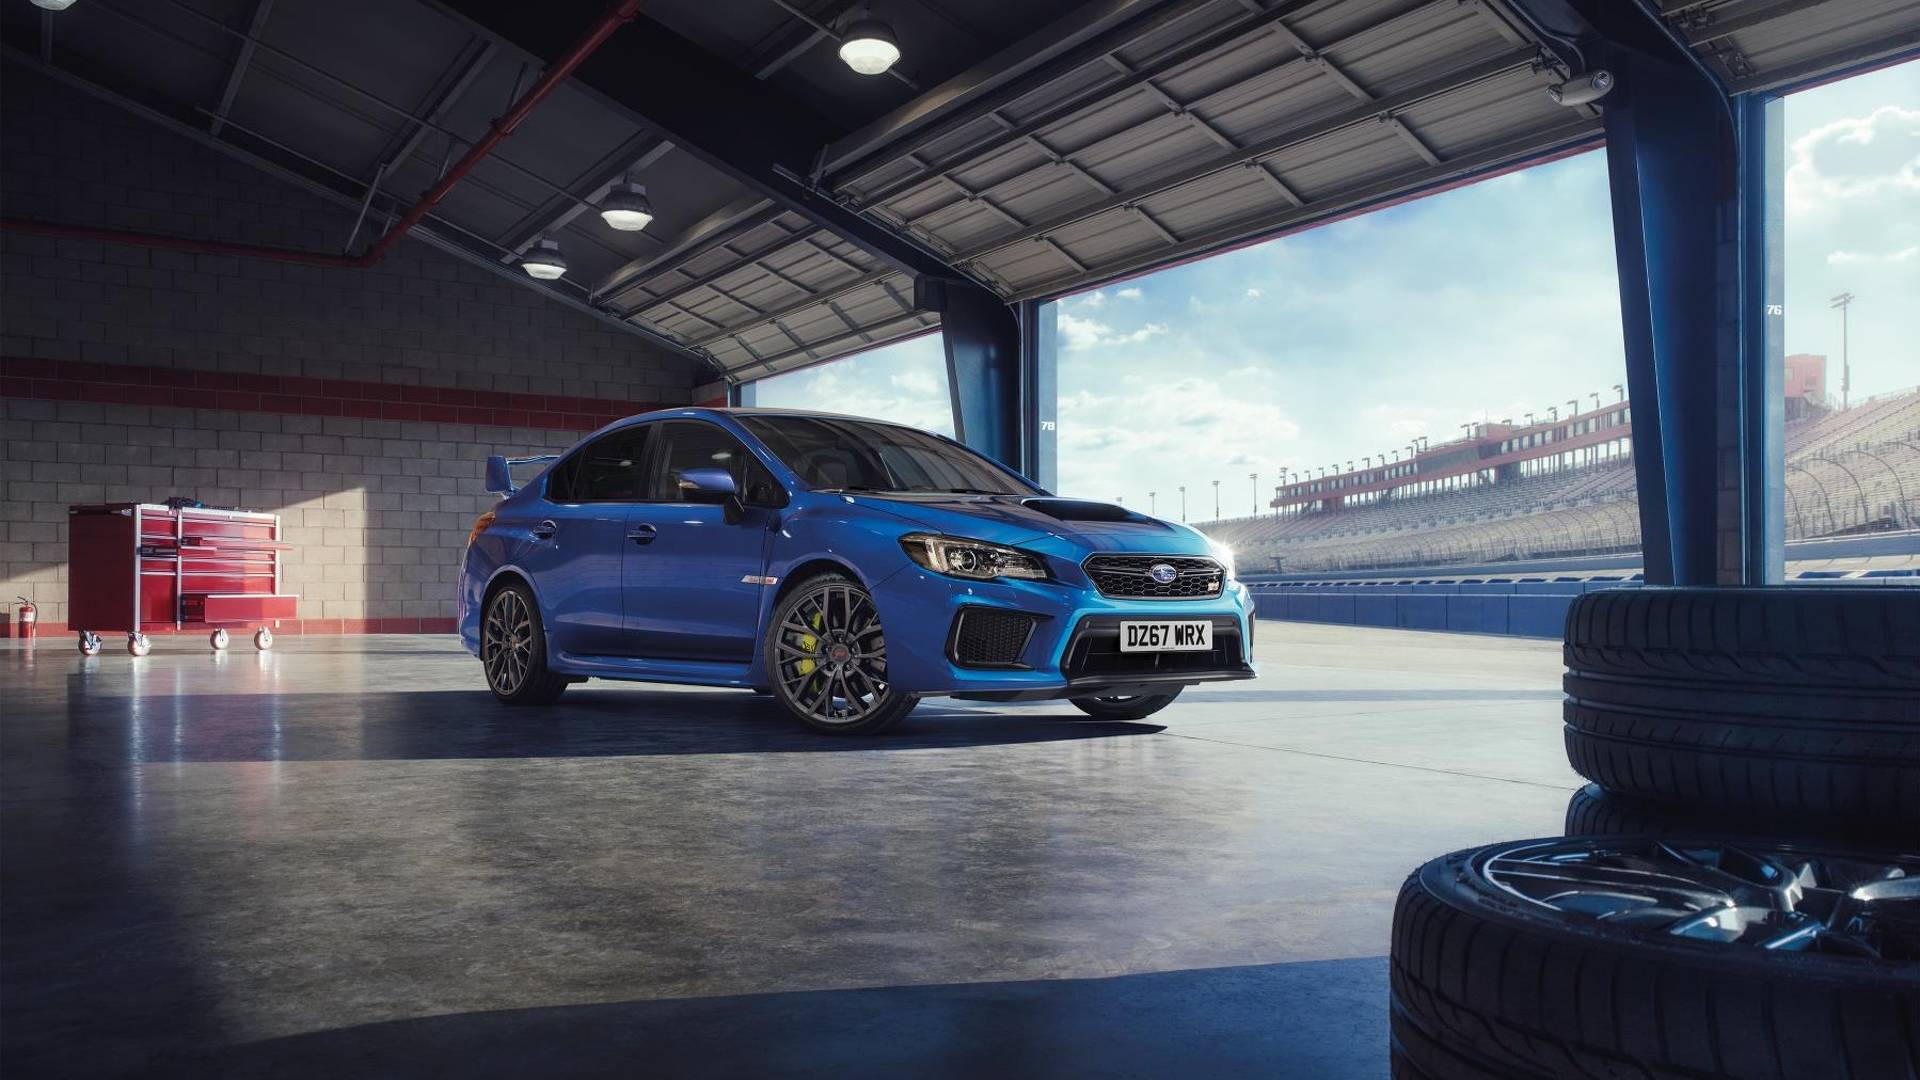 2019 Subaru Wrx Sti All But Confirmed To Develop 310 Horsepower